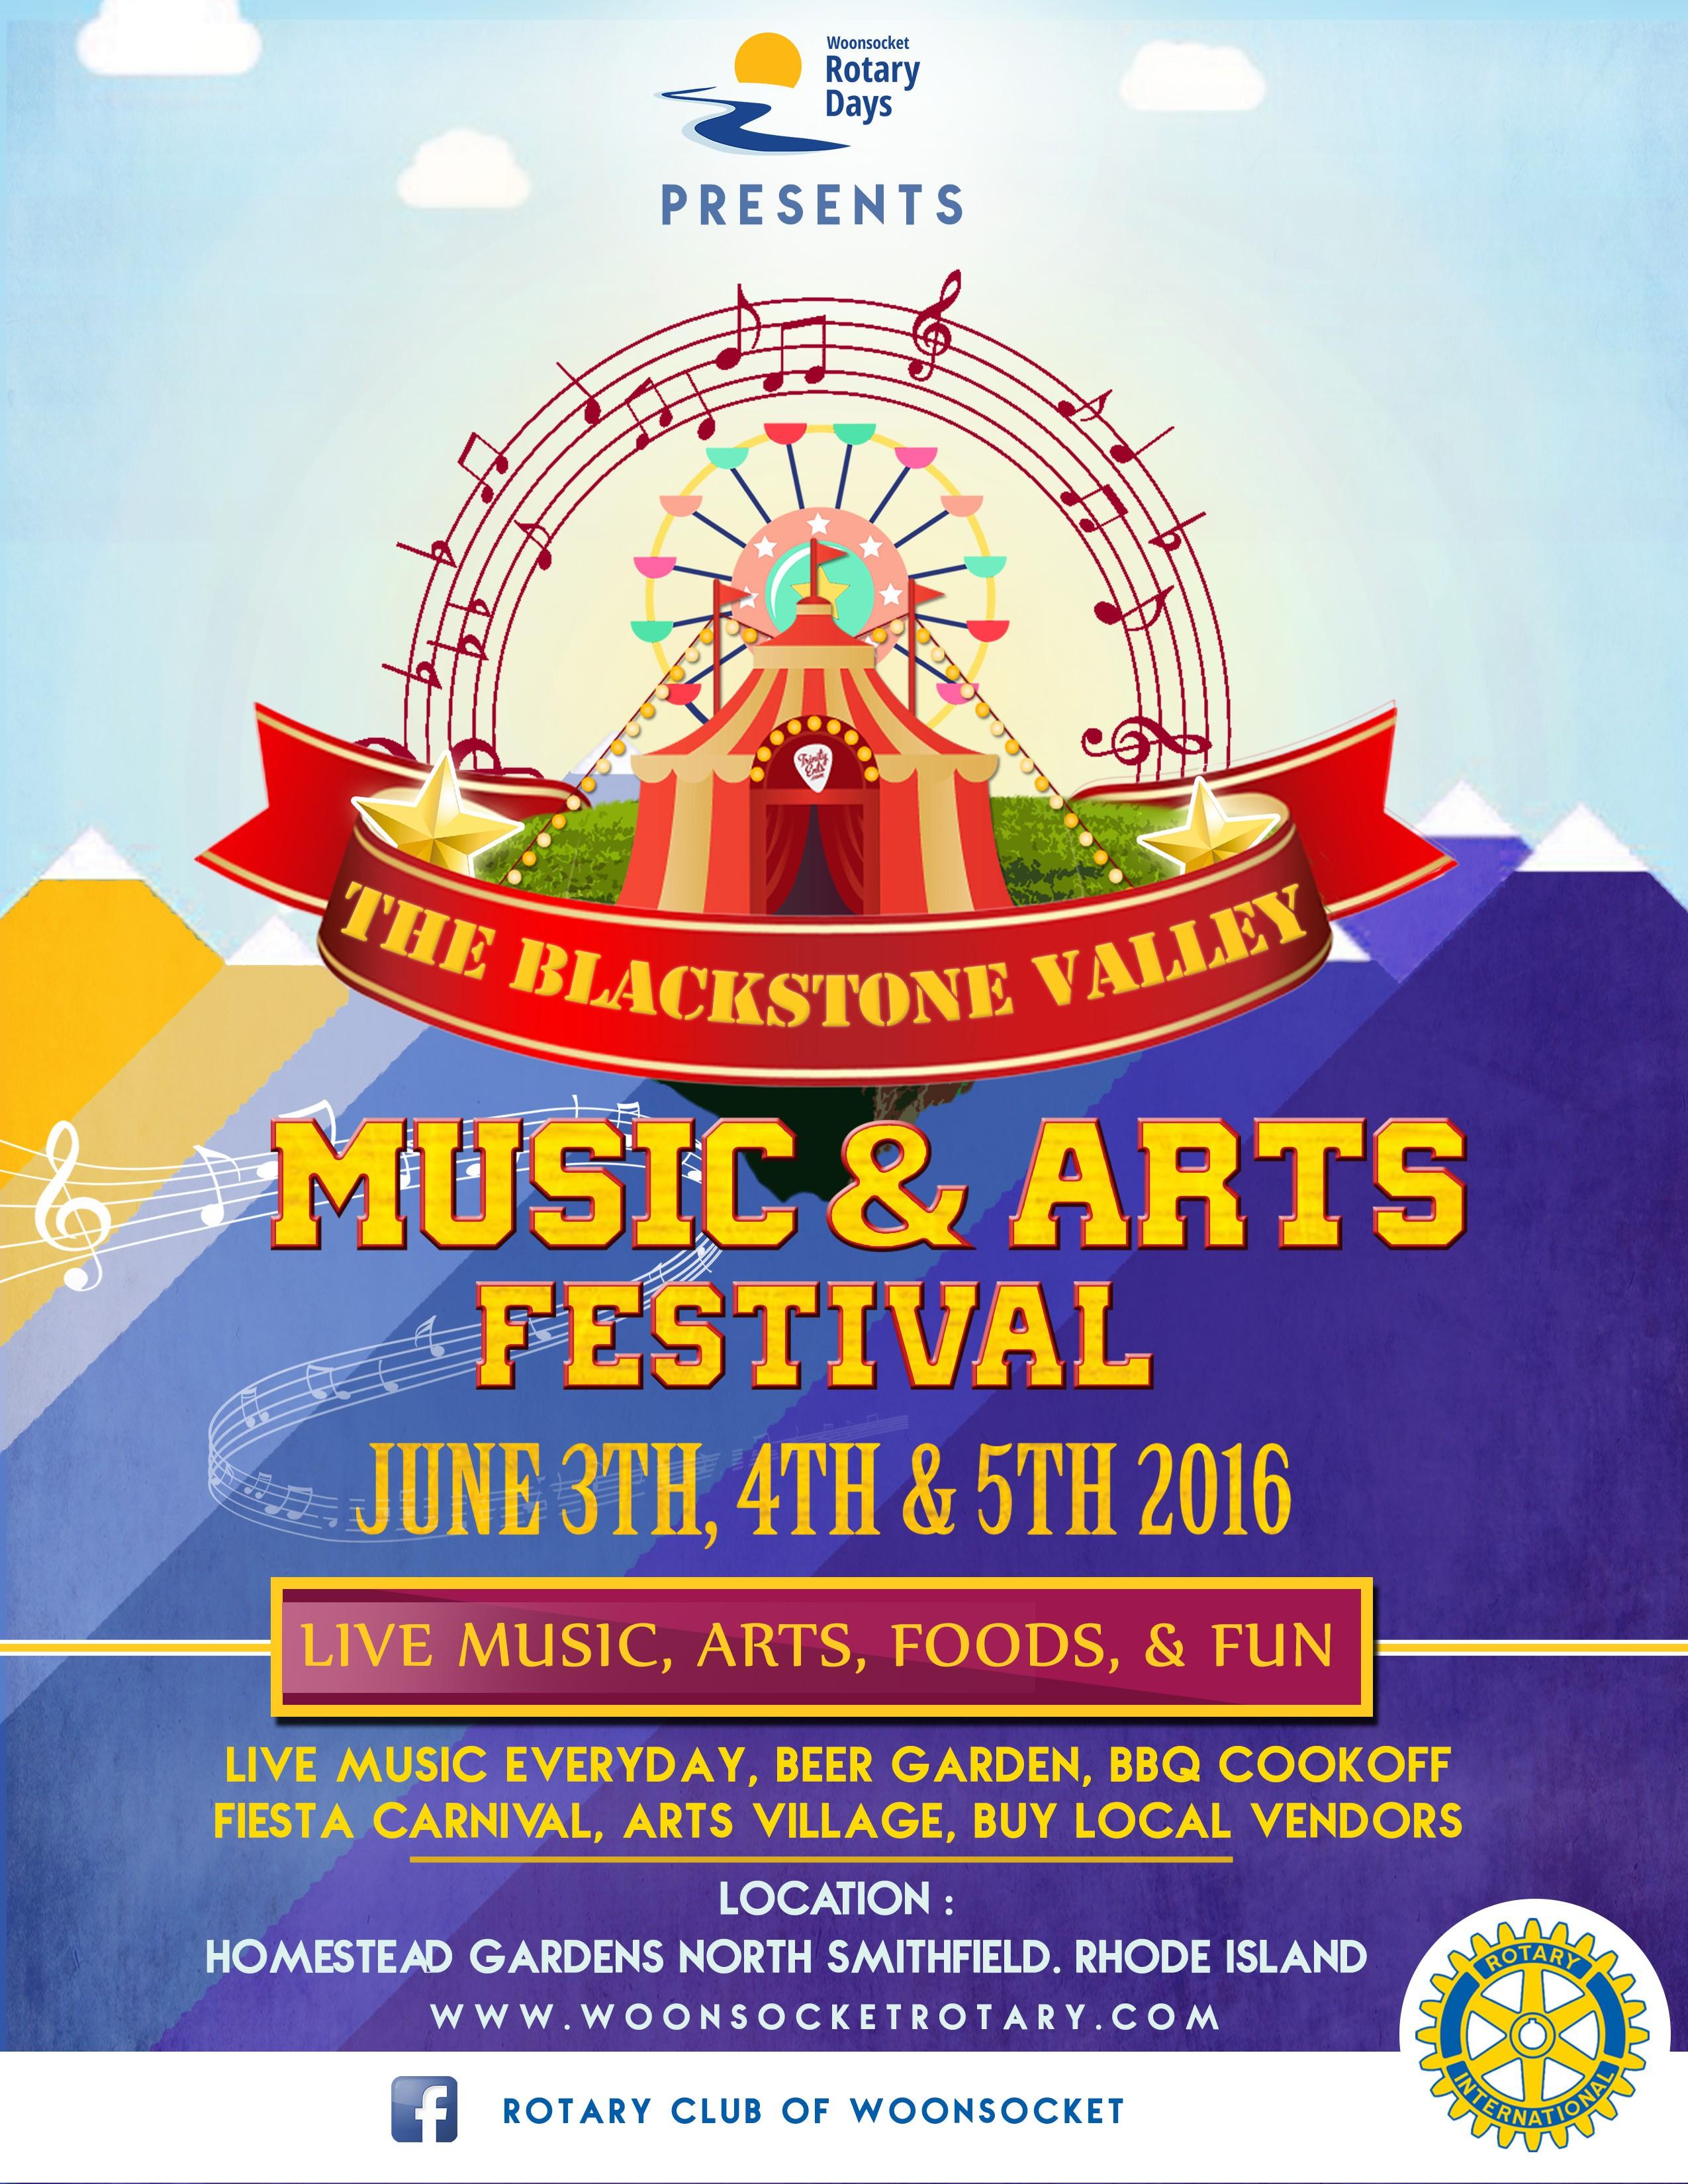 Blackstone Valley Music & Arts Festival